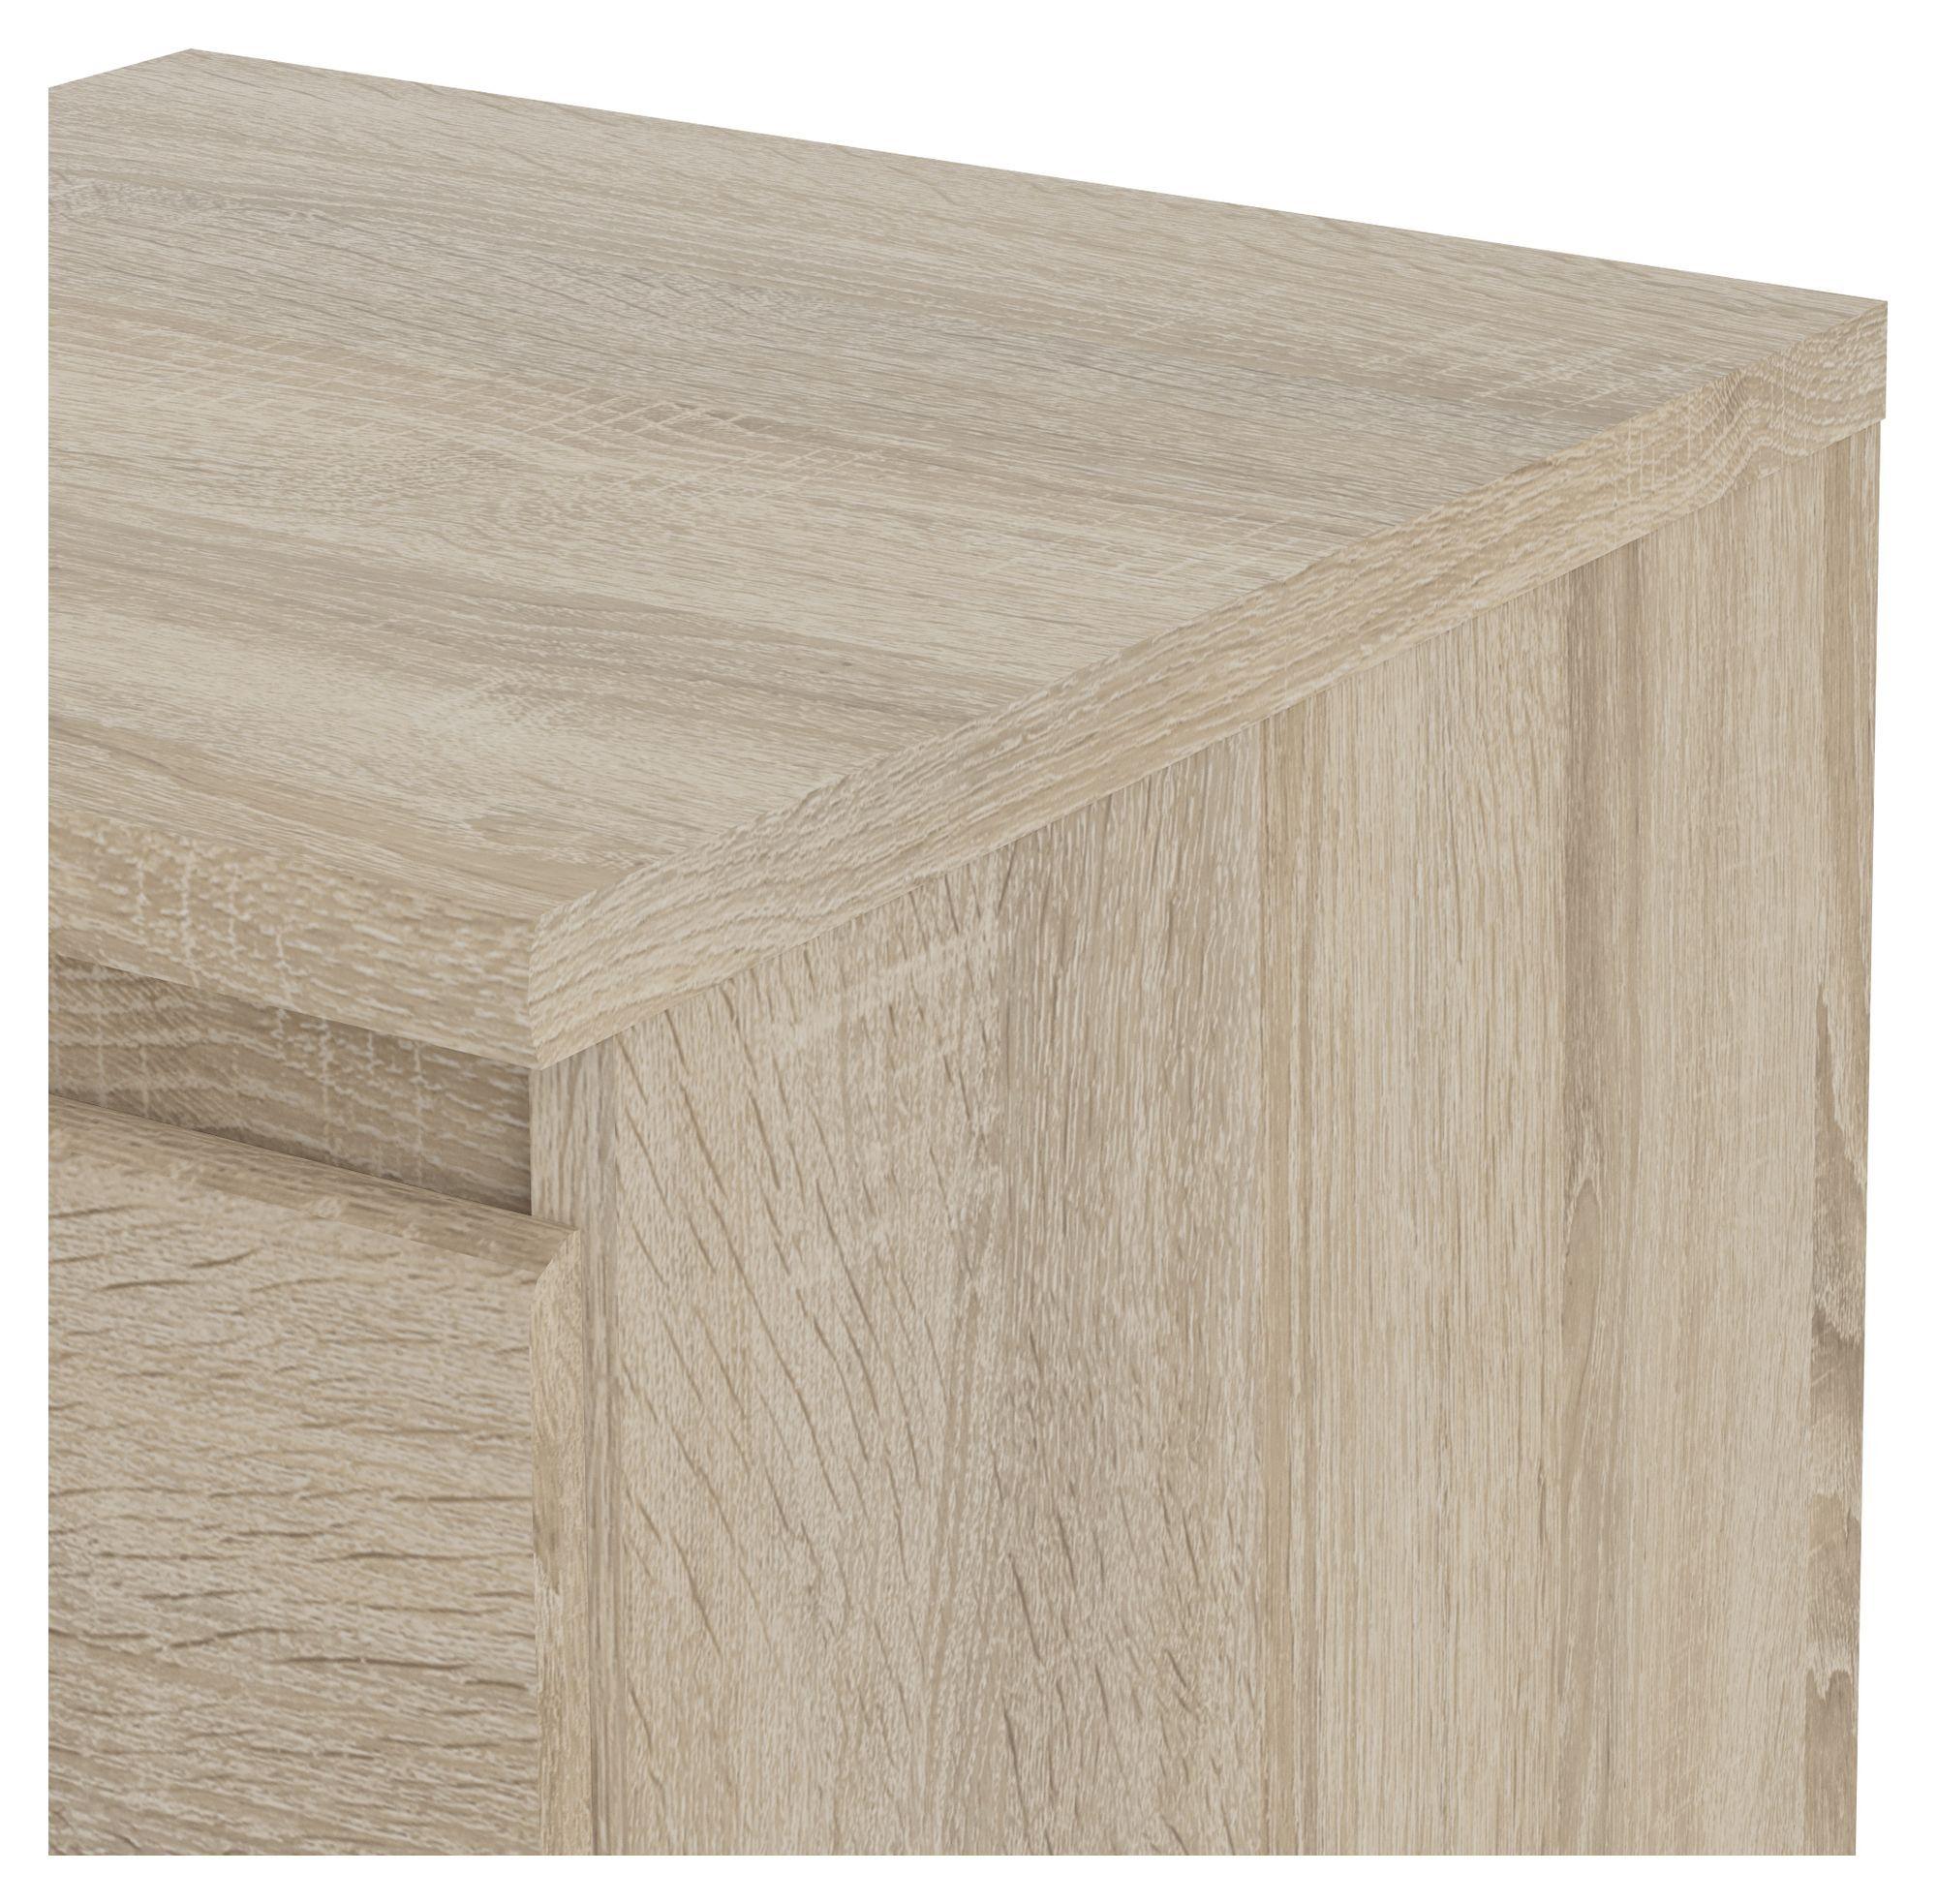 Naia Sengebord - Lys træ m/hylde - Sengebord i egetræs-look